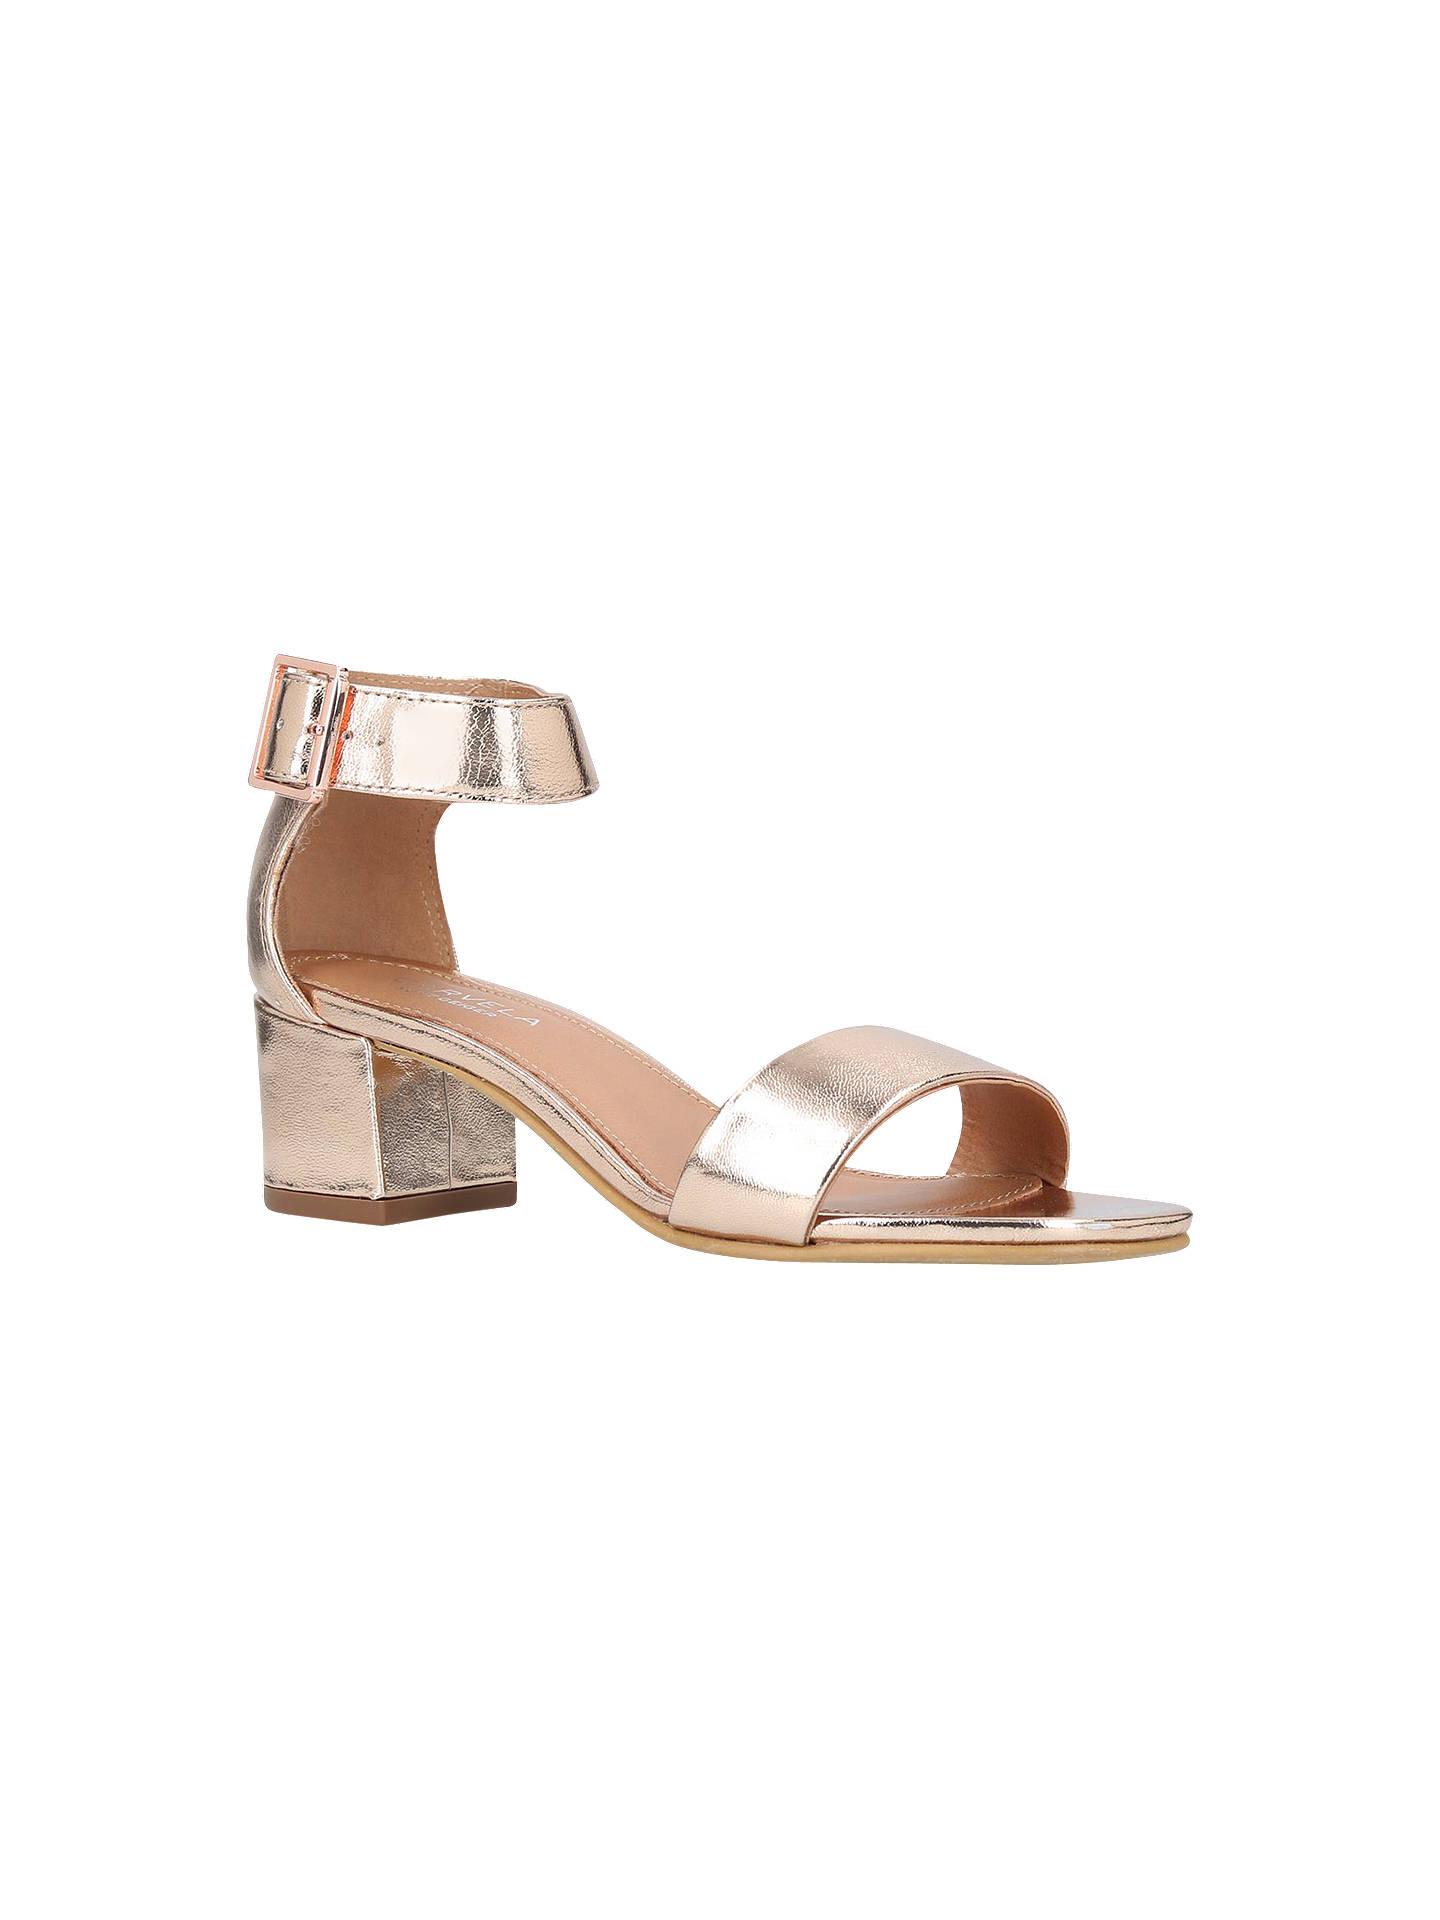 83395ba4273 Carvela Shadow Block Heeled Sandals at John Lewis   Partners